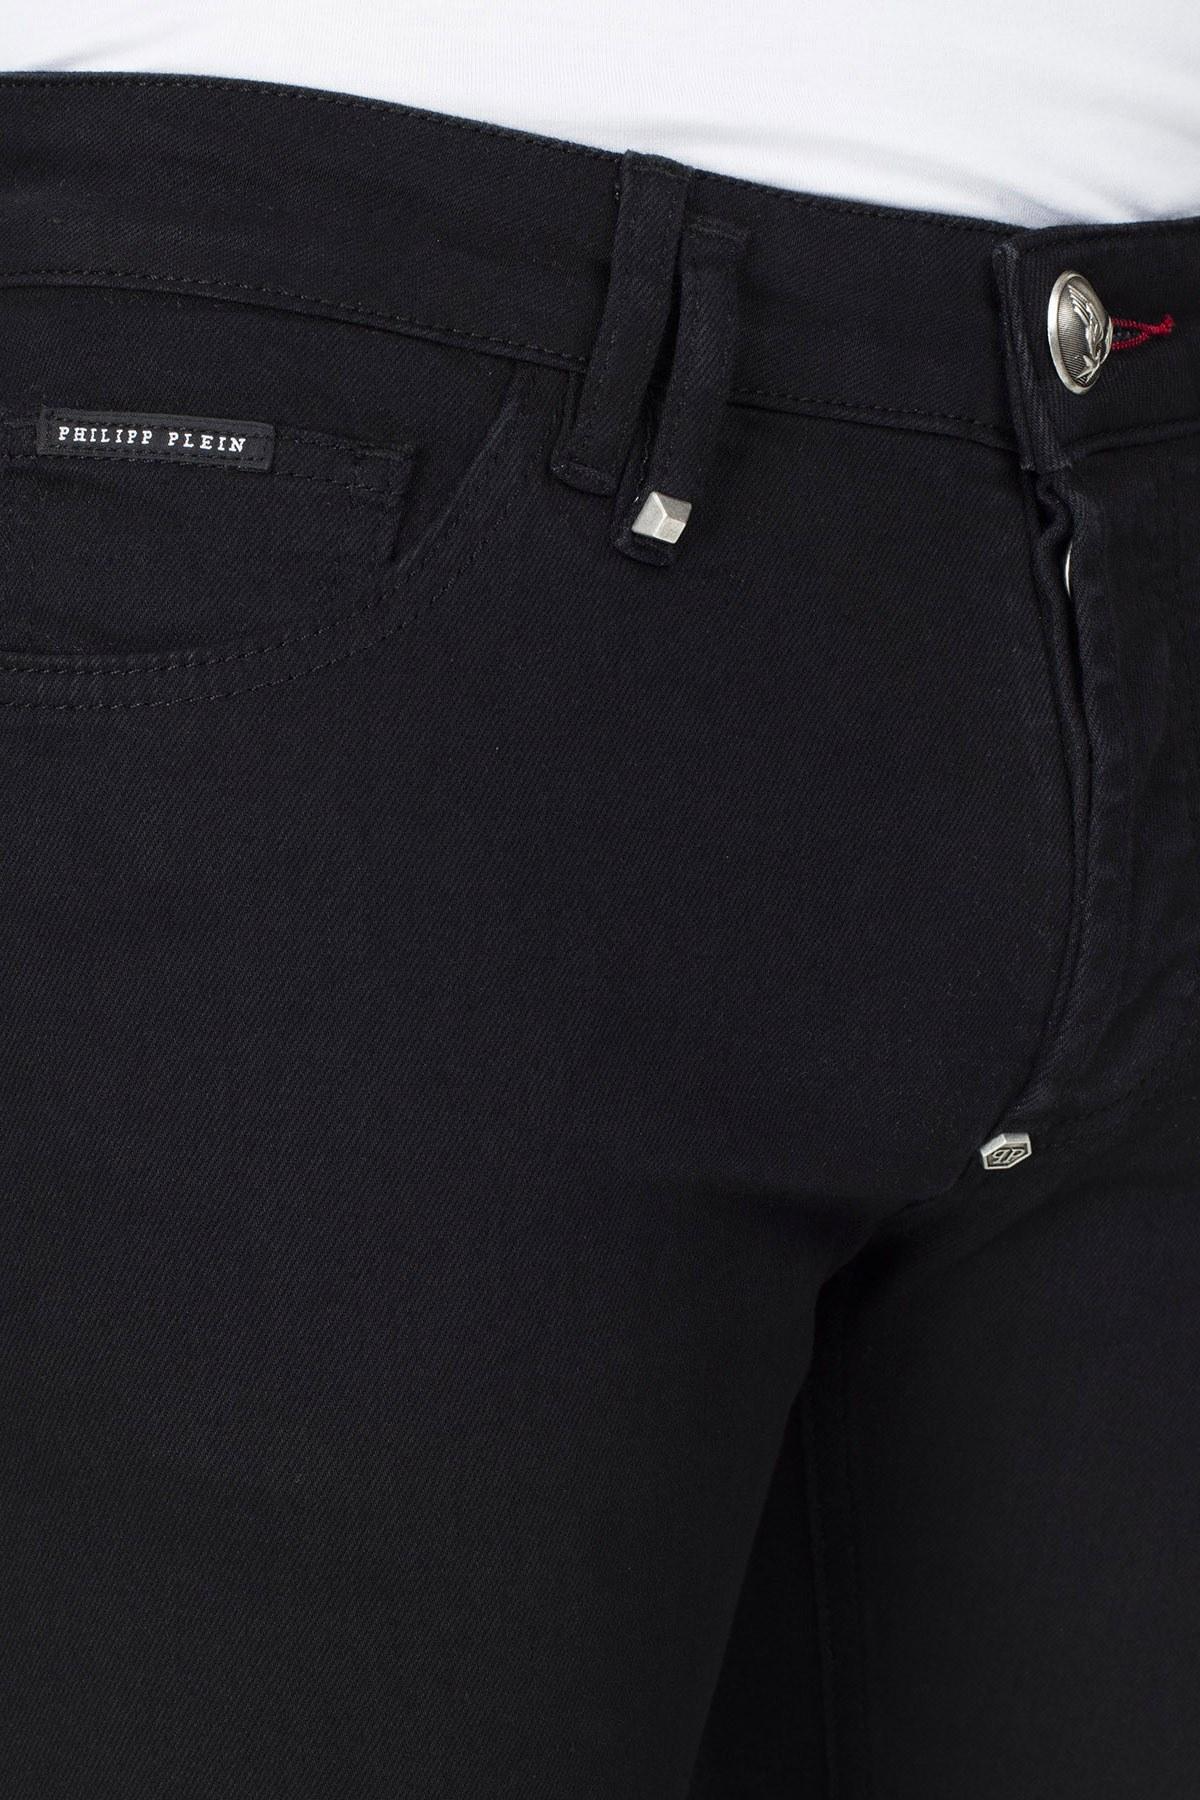 Philipp Plein Jeans Erkek Kot Pantolon P20C MDT2168 PDE004N 02TE SİYAH